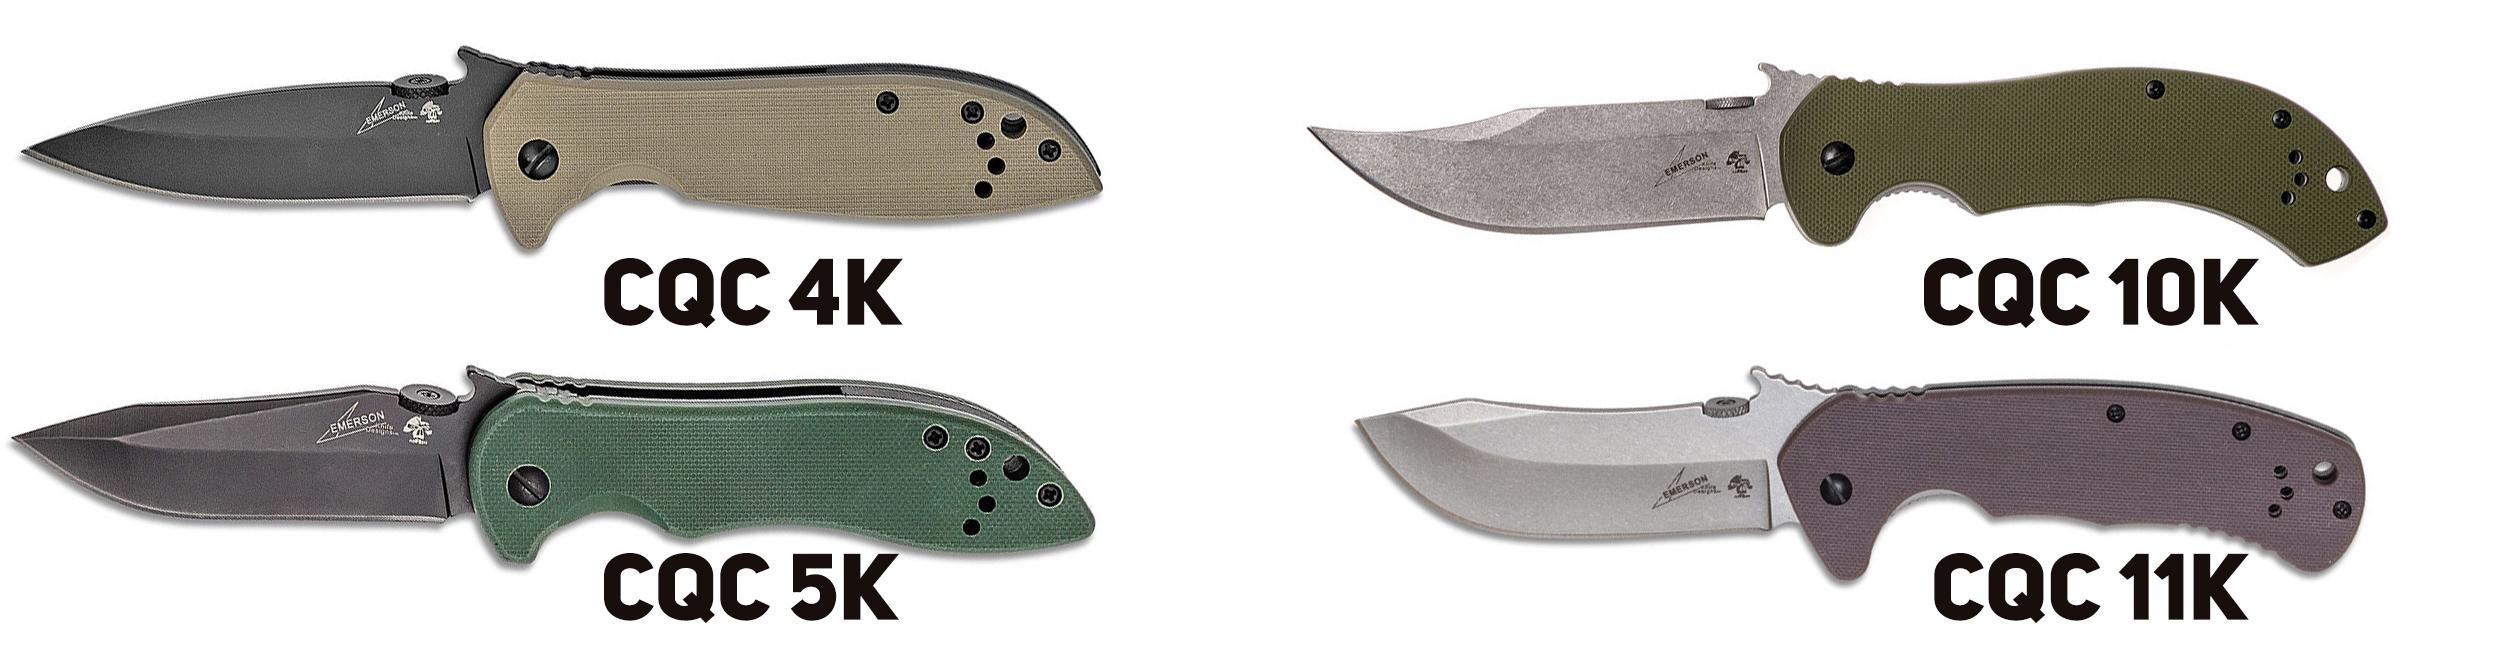 Ножи Эмерсона для Kershaw